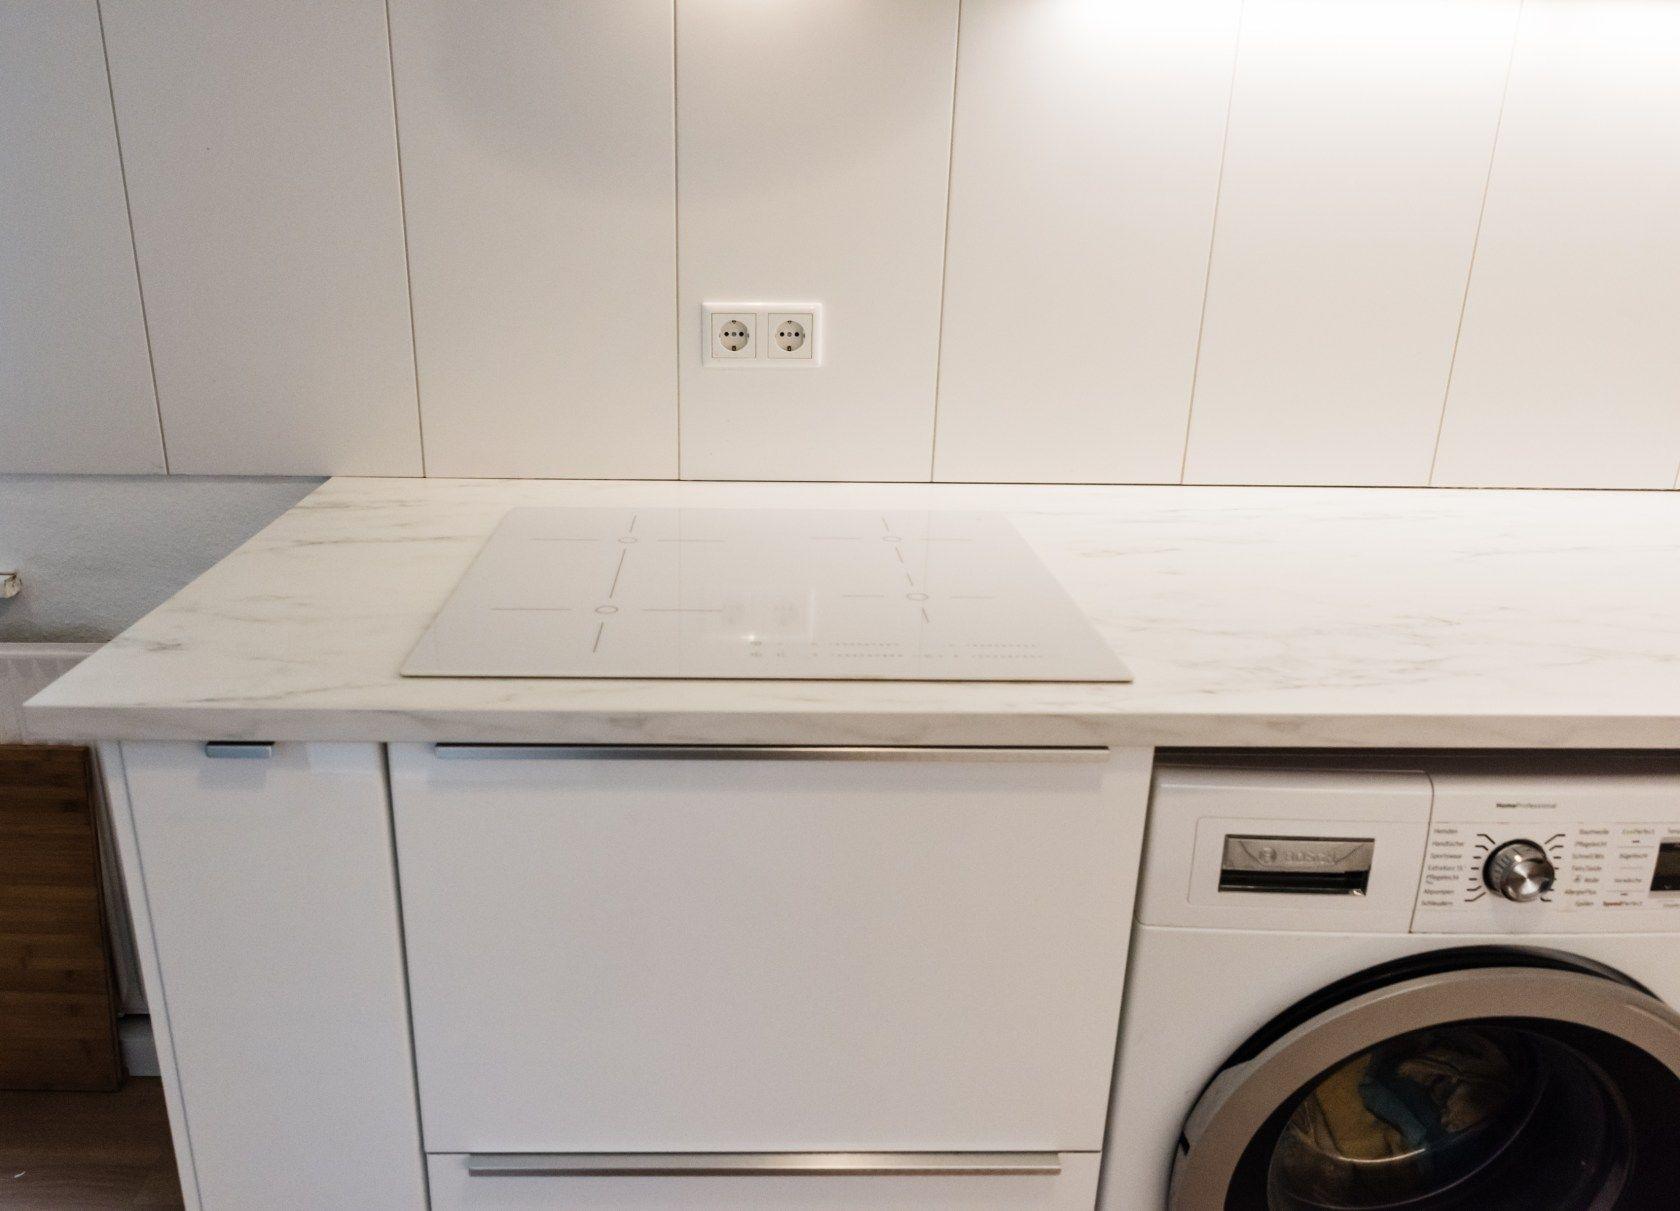 Ekbacken marble countertops - Ikea Metod, Metod, Ikea Küche ...